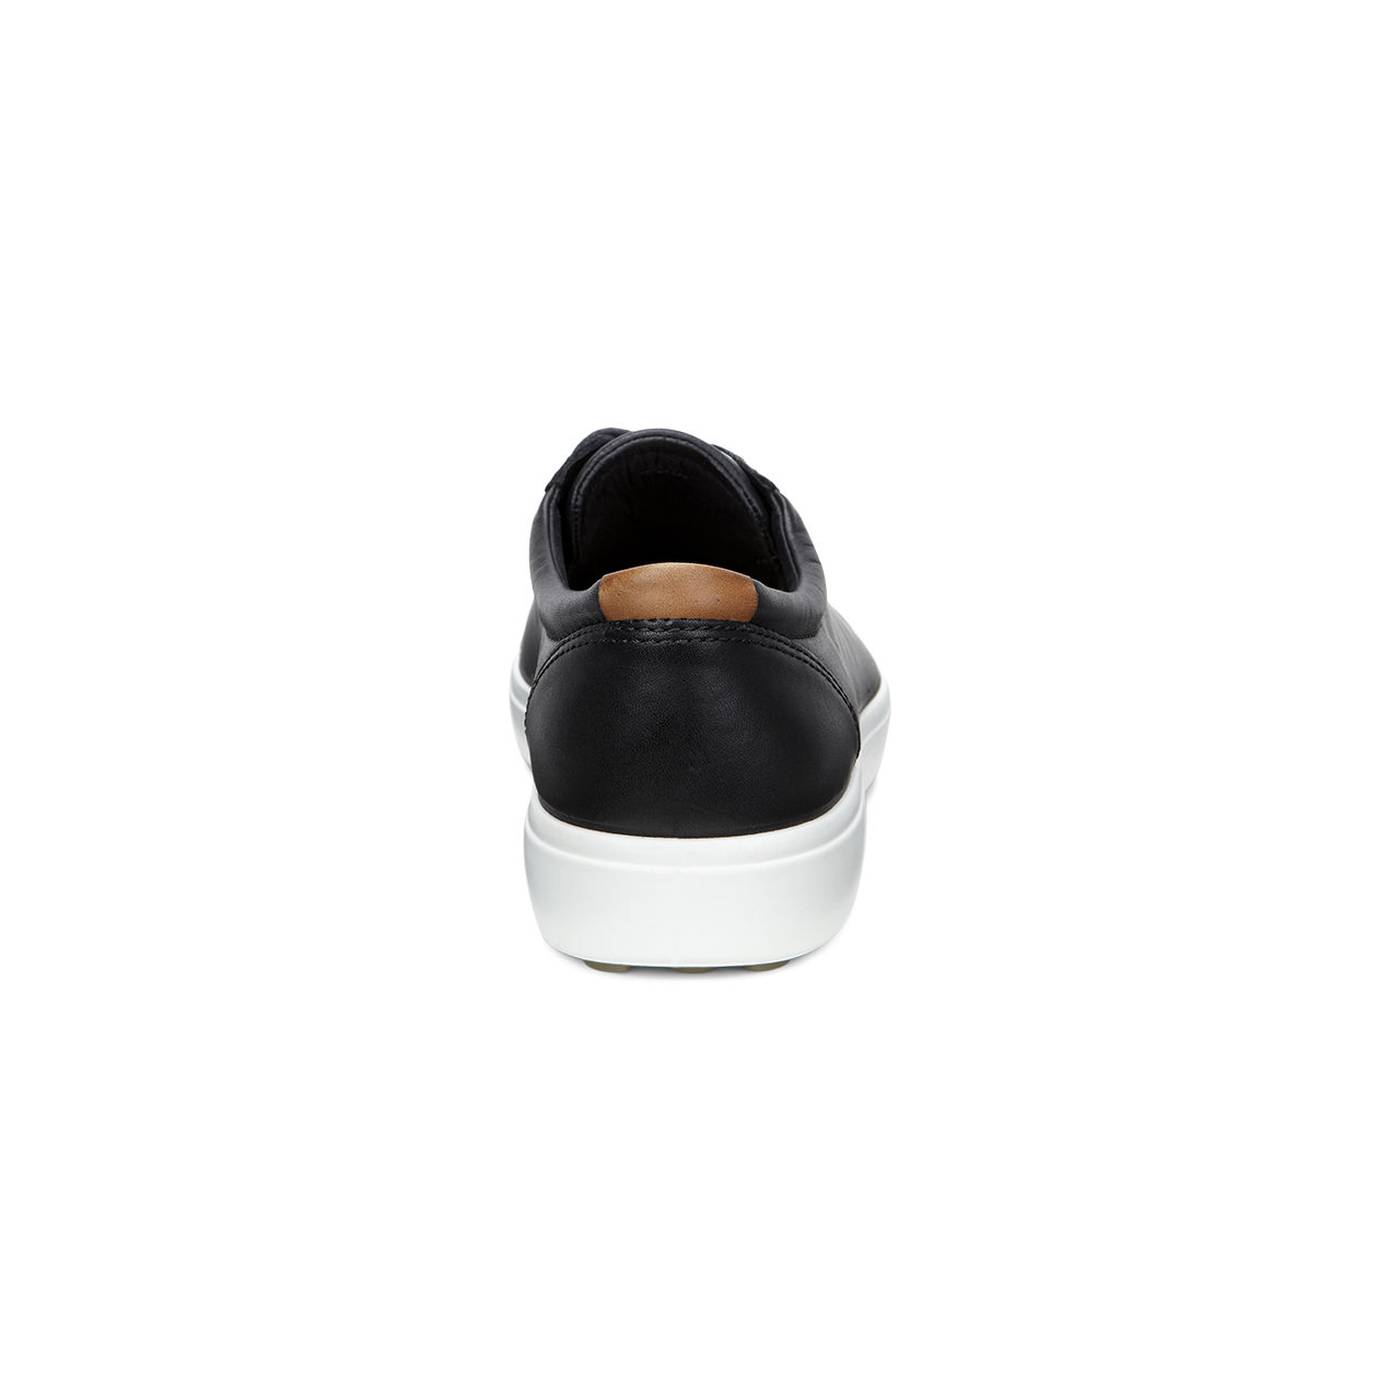 d884afed ECCO Men's Soft 7 Sneaker | Men's Casual Shoes | ECCO® Shoes